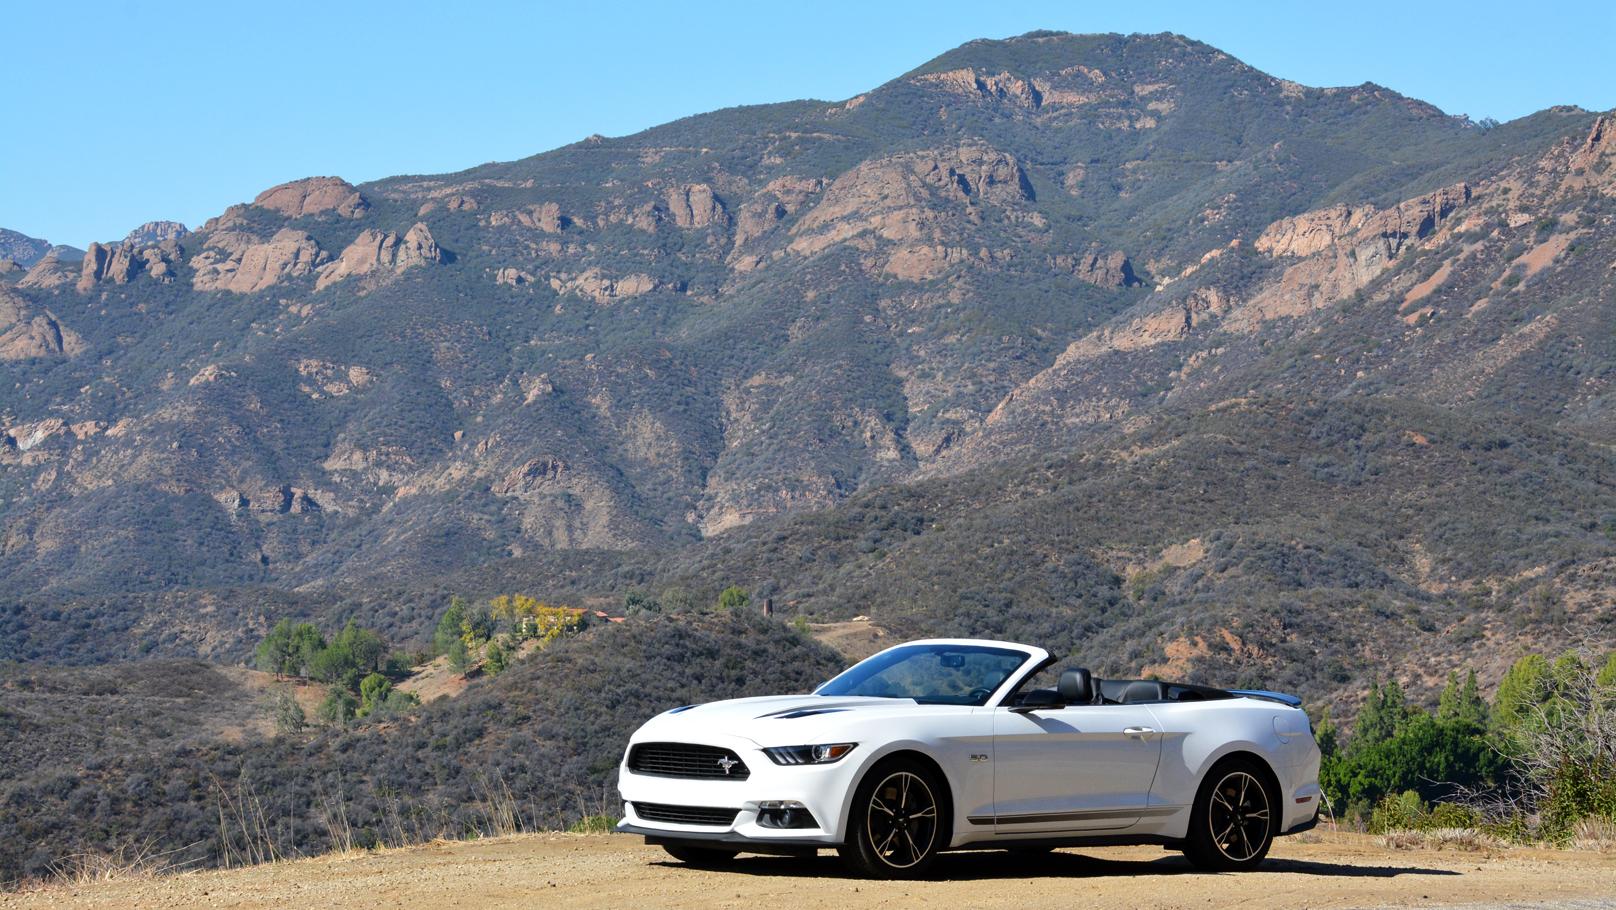 Mustang GT California